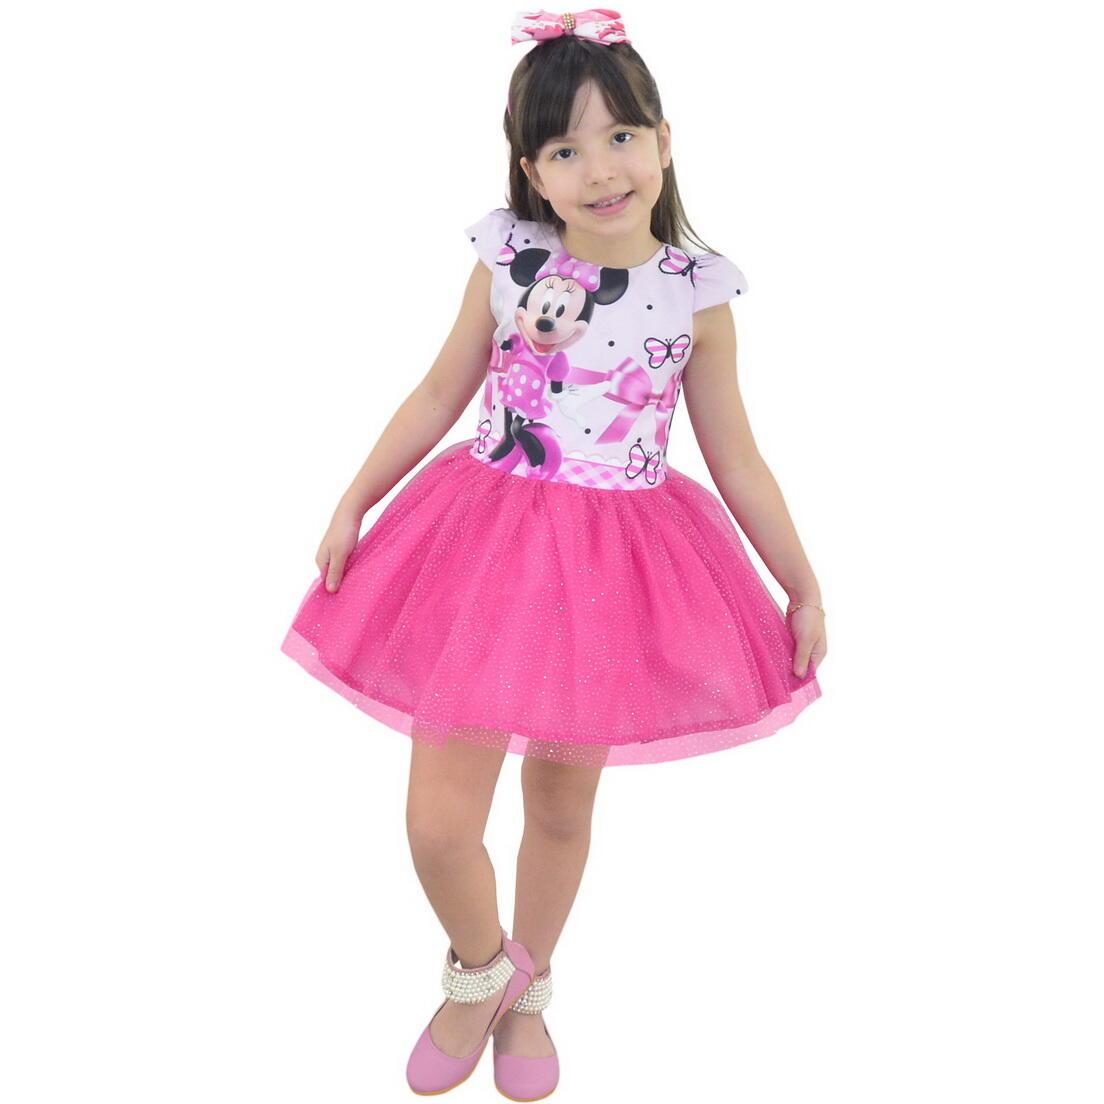 Vestido da Minnie Rosa Saia de Tule(Tutu) Com Glitter